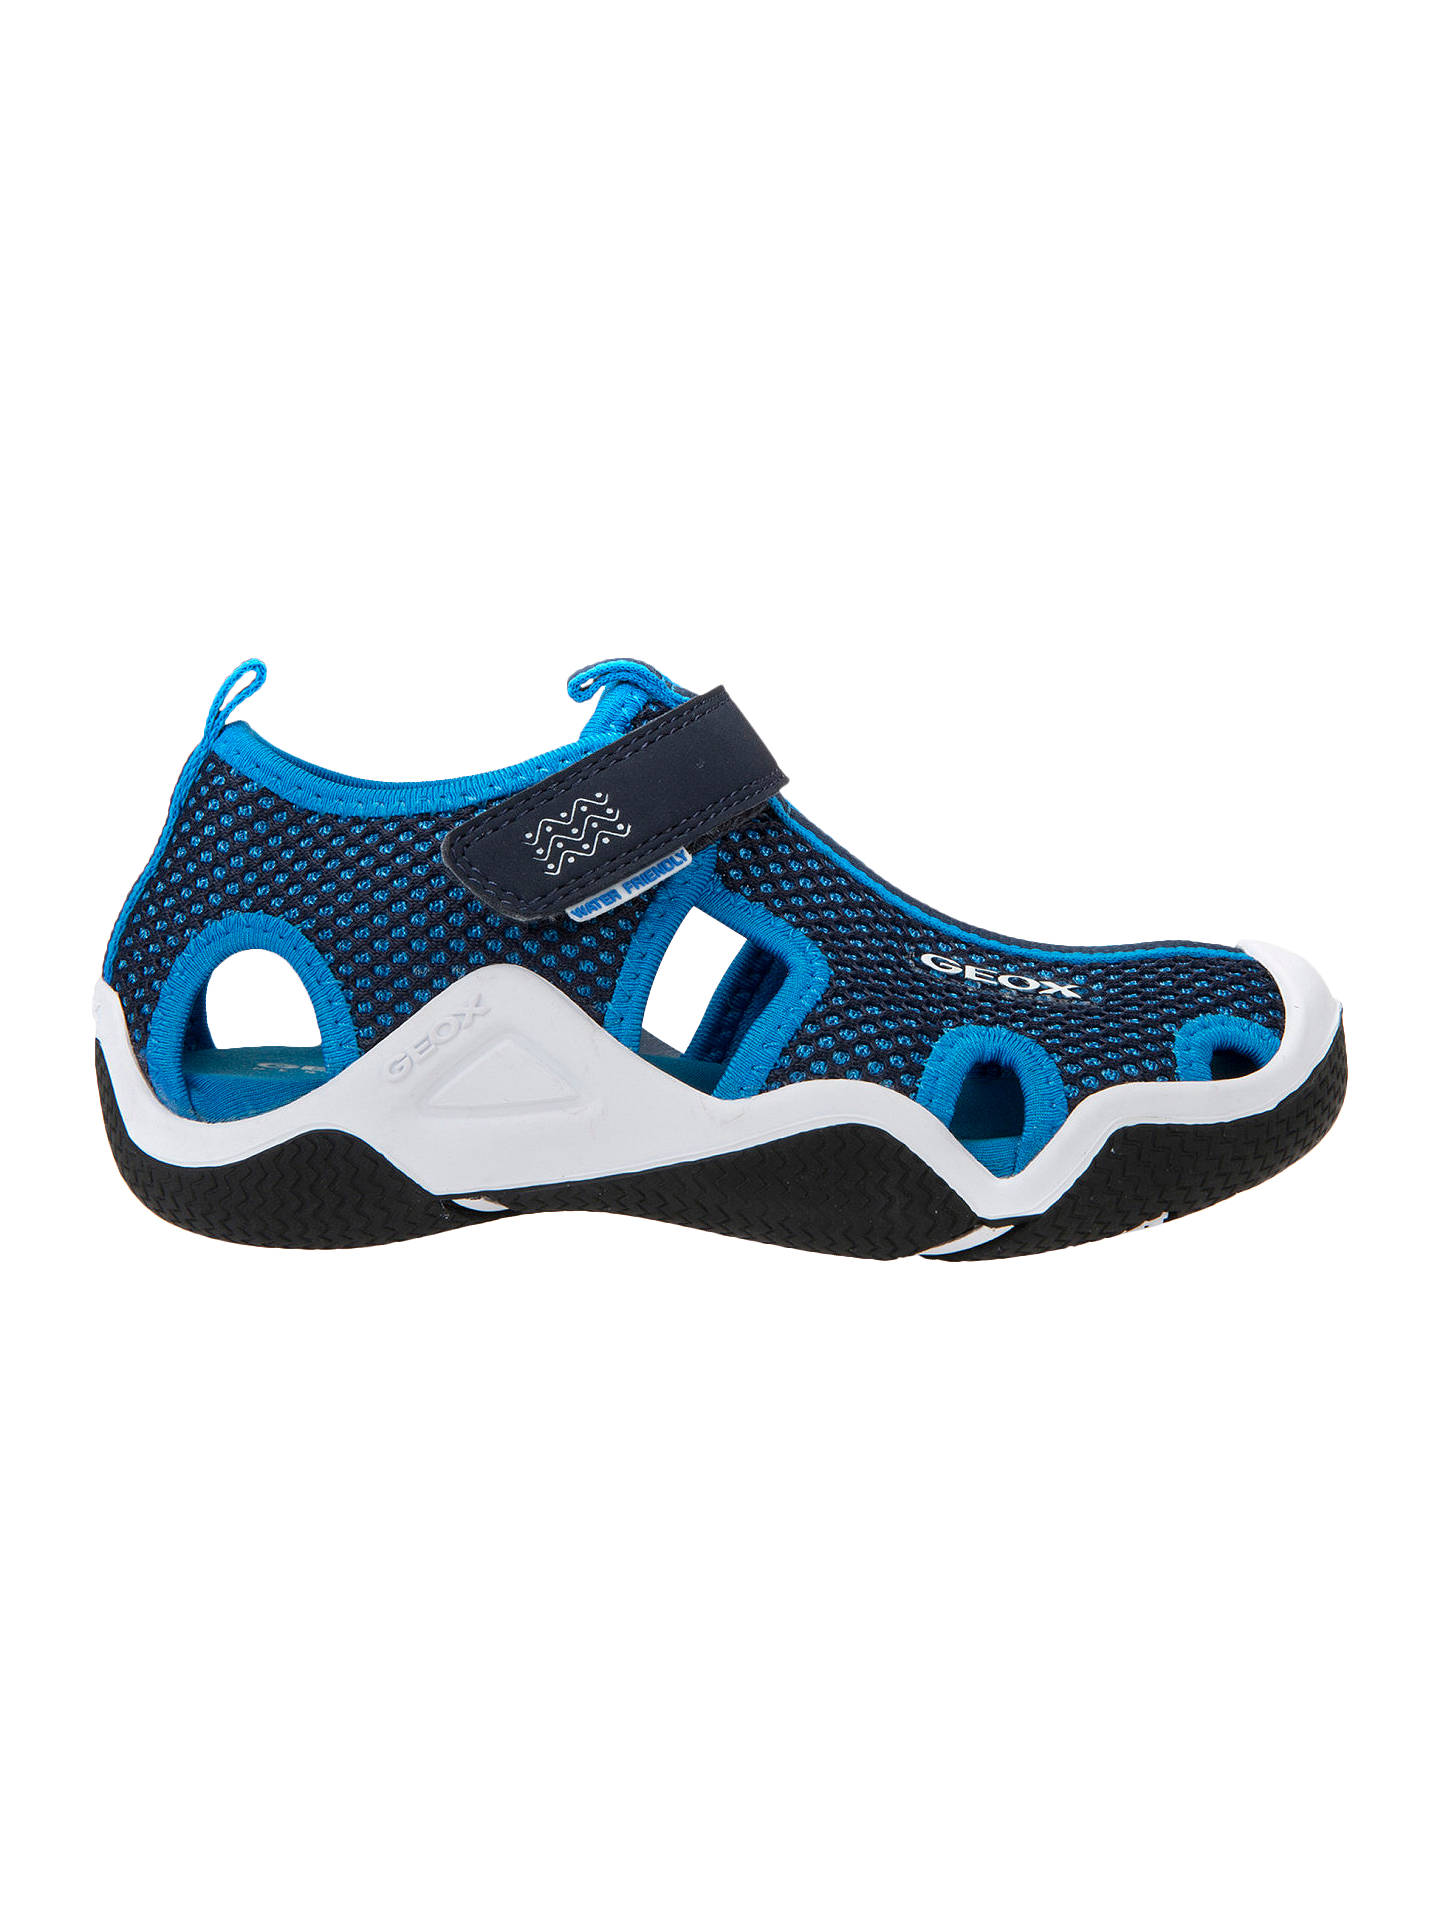 Geox Wader Boys Water friendly Sandal | Shooligans Shoes